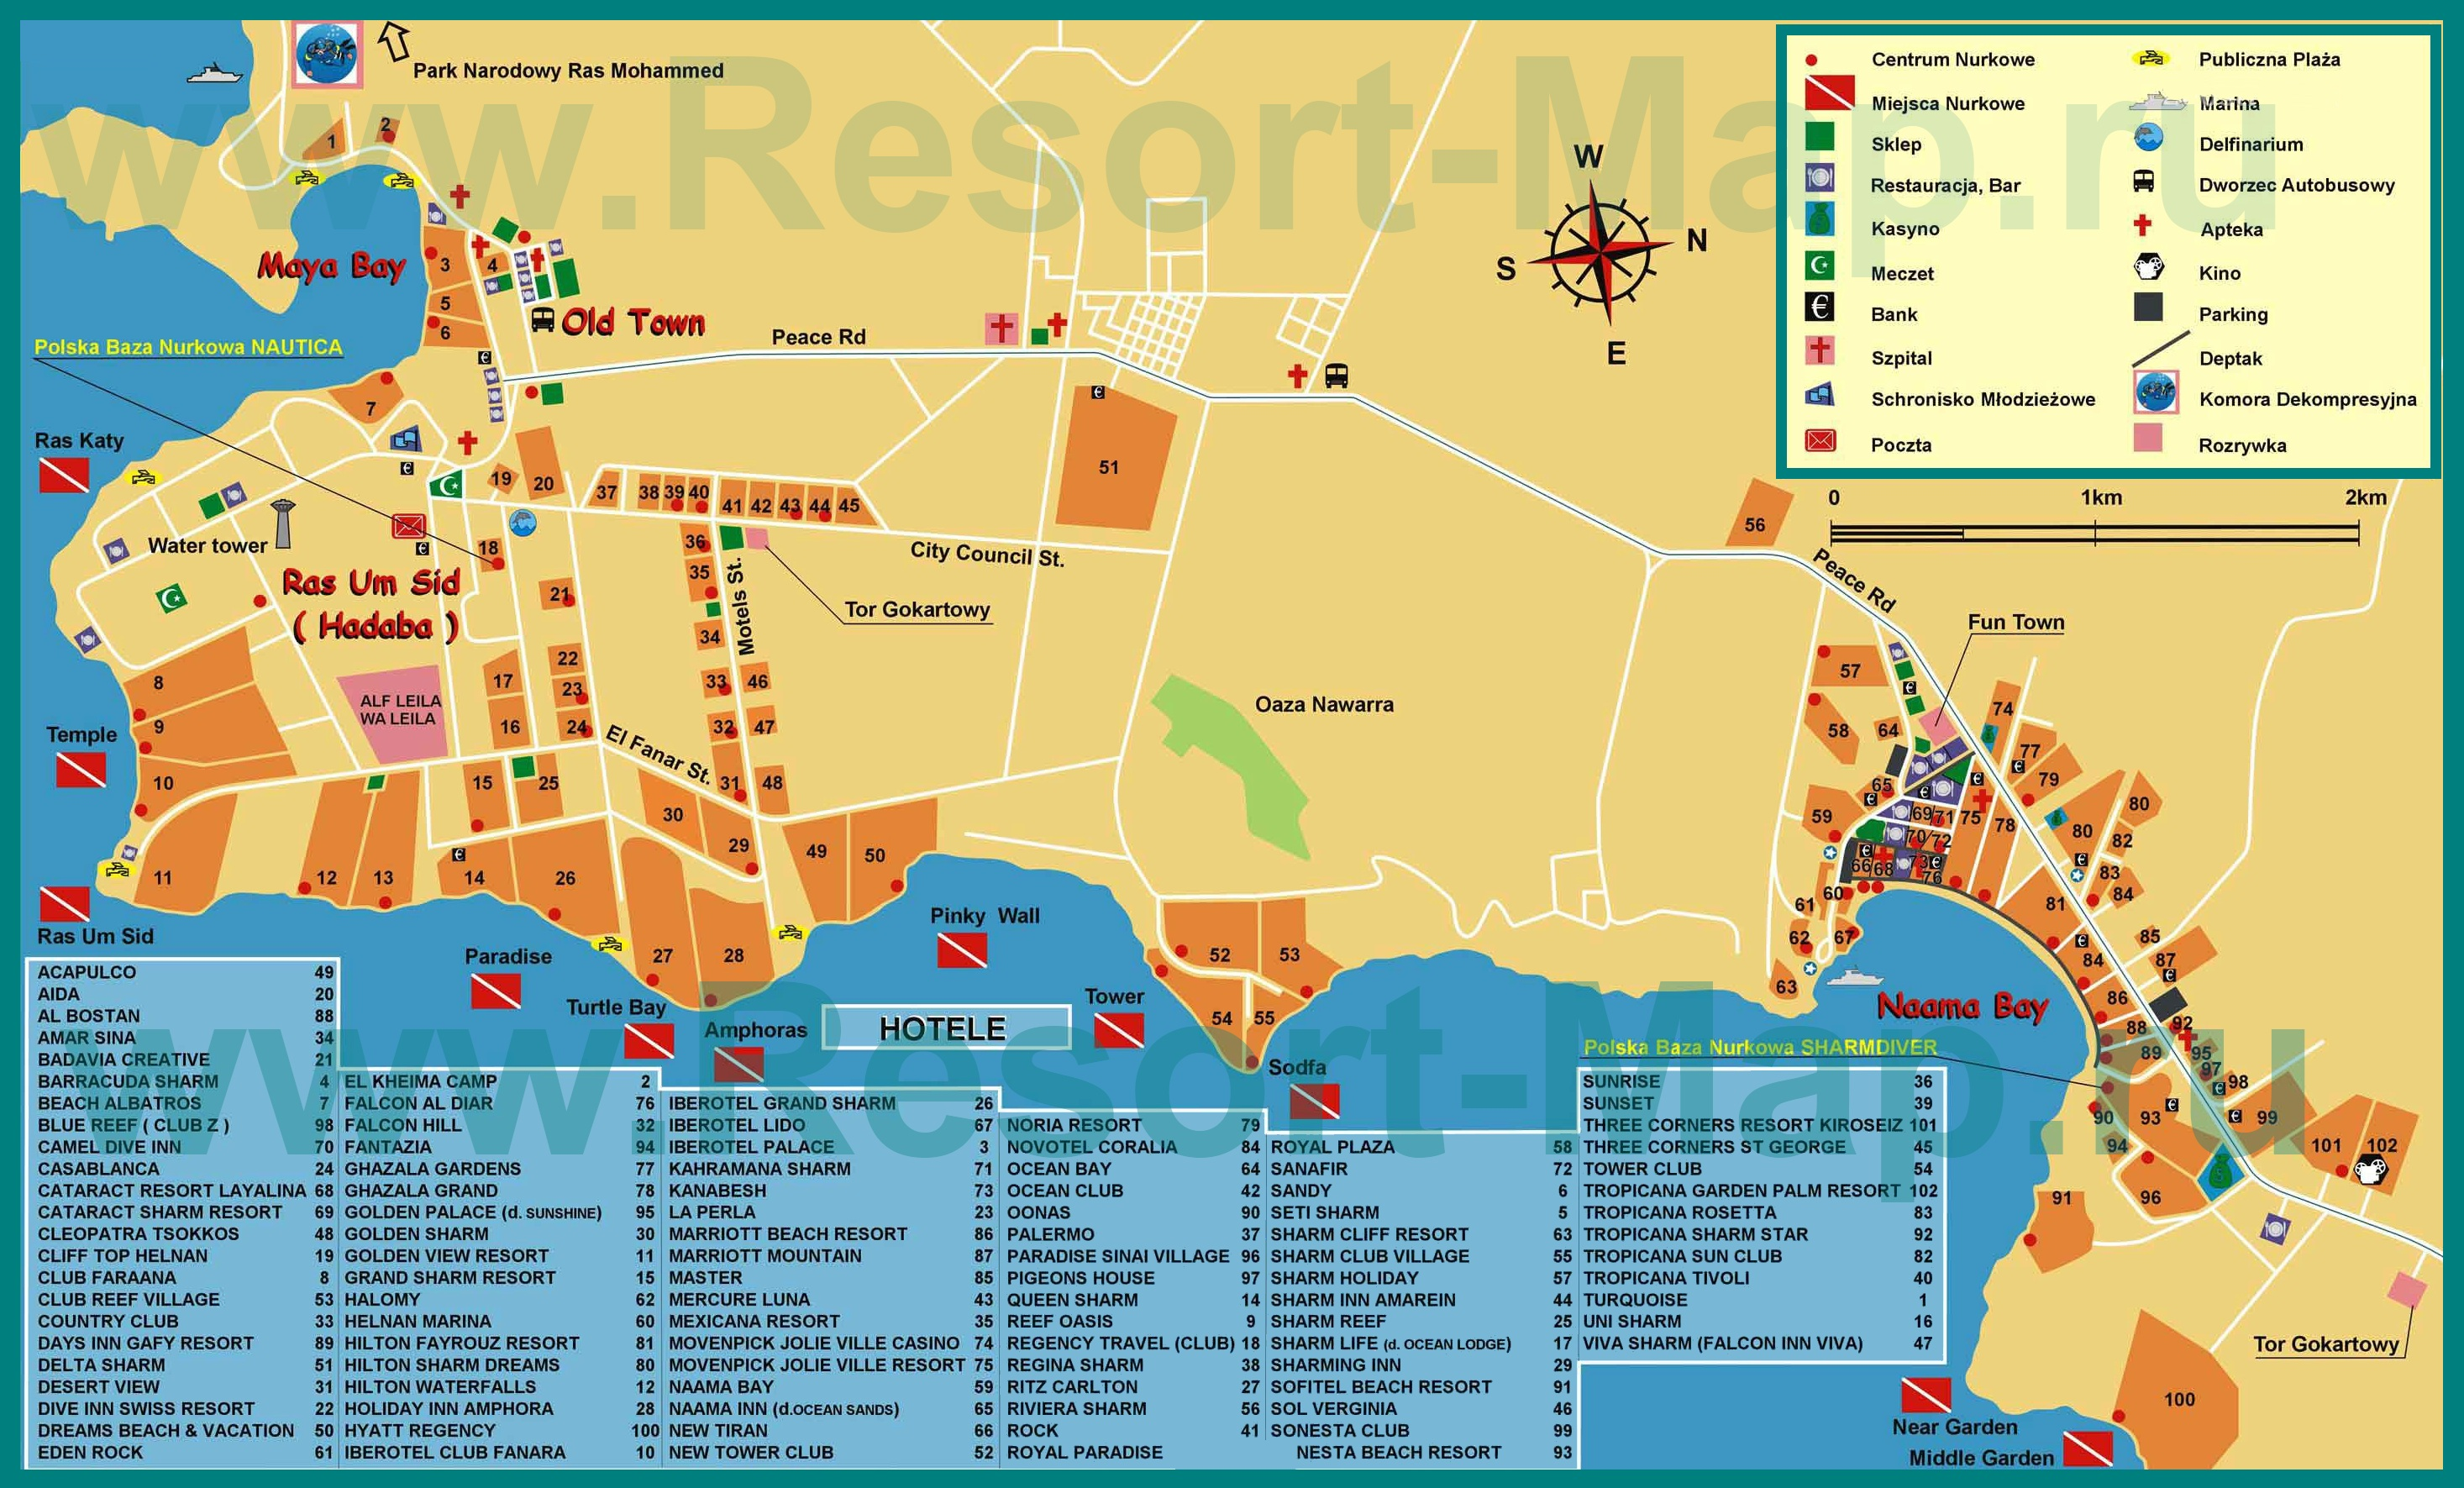 Карта Шарм Эль Шейха С Отелями - free-luxury: http://free-luxury.weebly.com/blog/karta-sharm-el-sheyha-s-otelyami